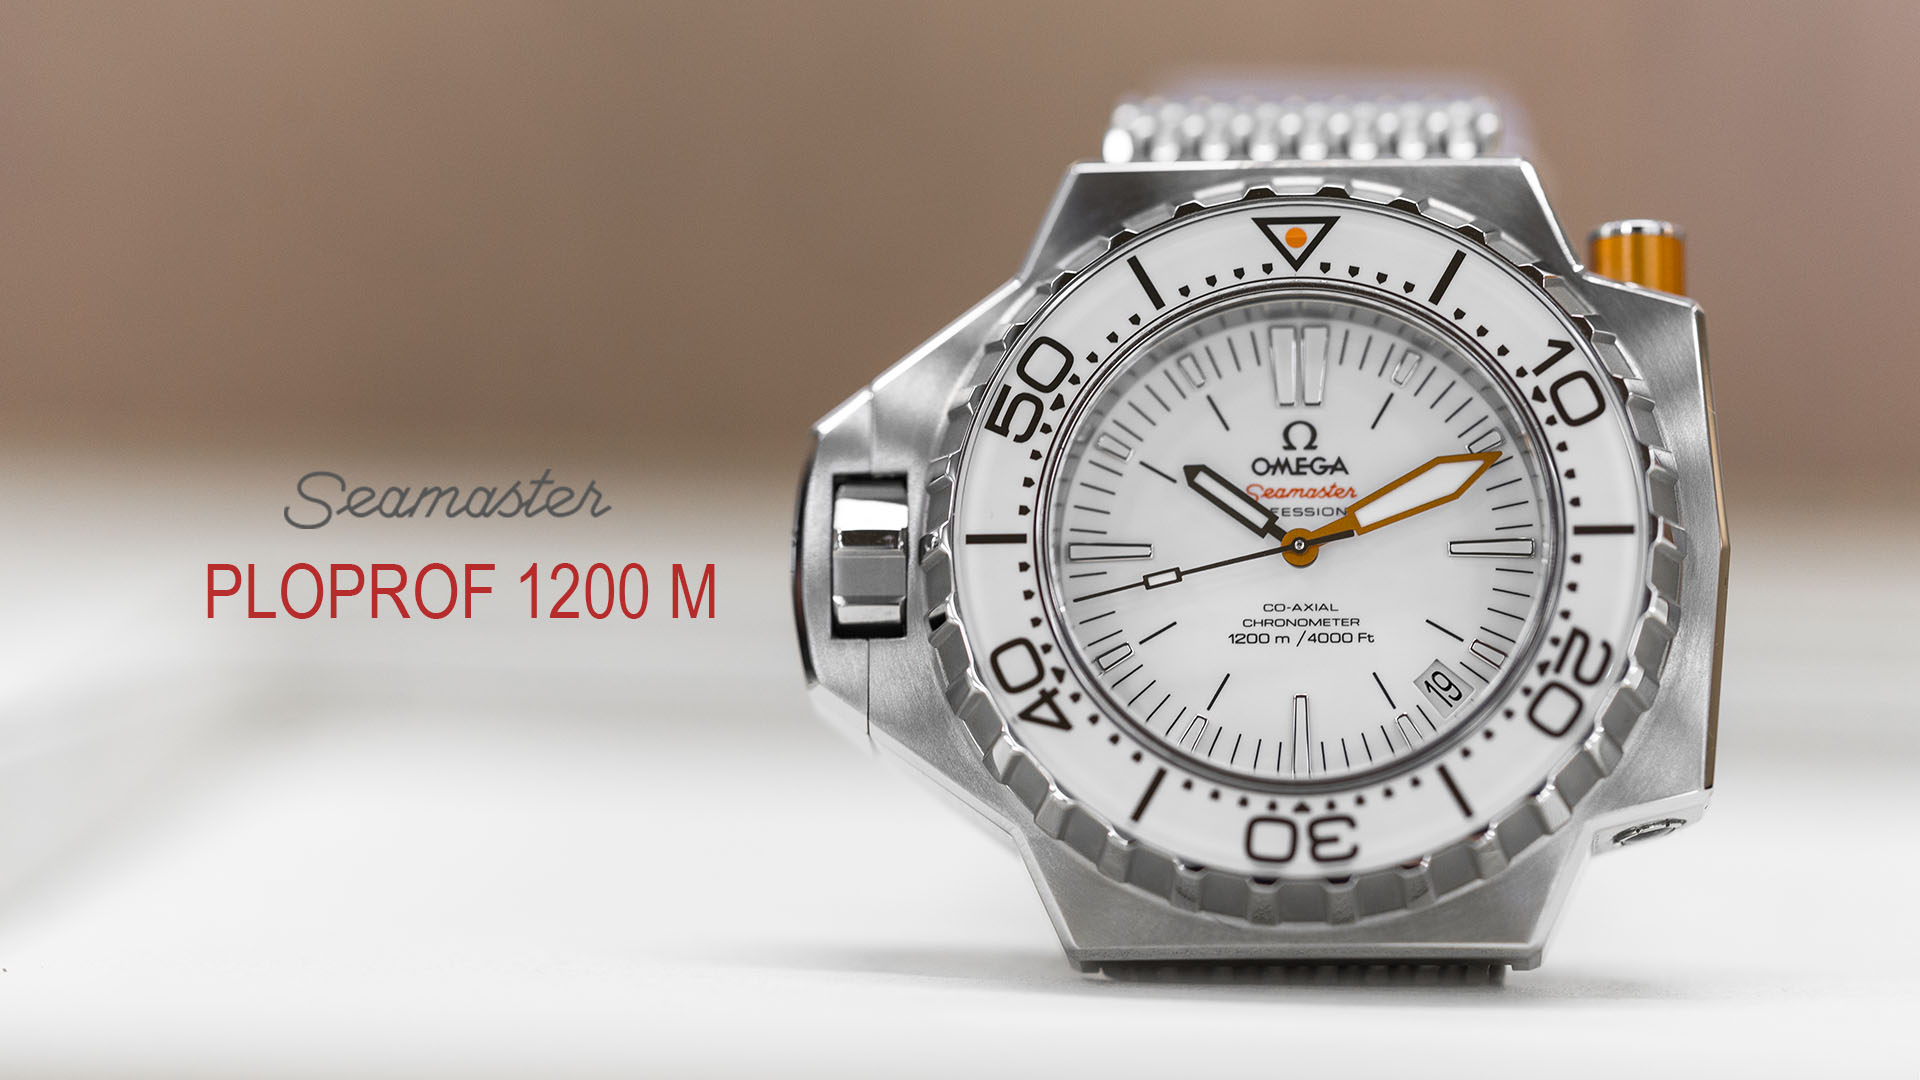 OMEGA-SEAMASTER-PLOPROF-1200-M-224-30-55-21-04-001-1-.JPG